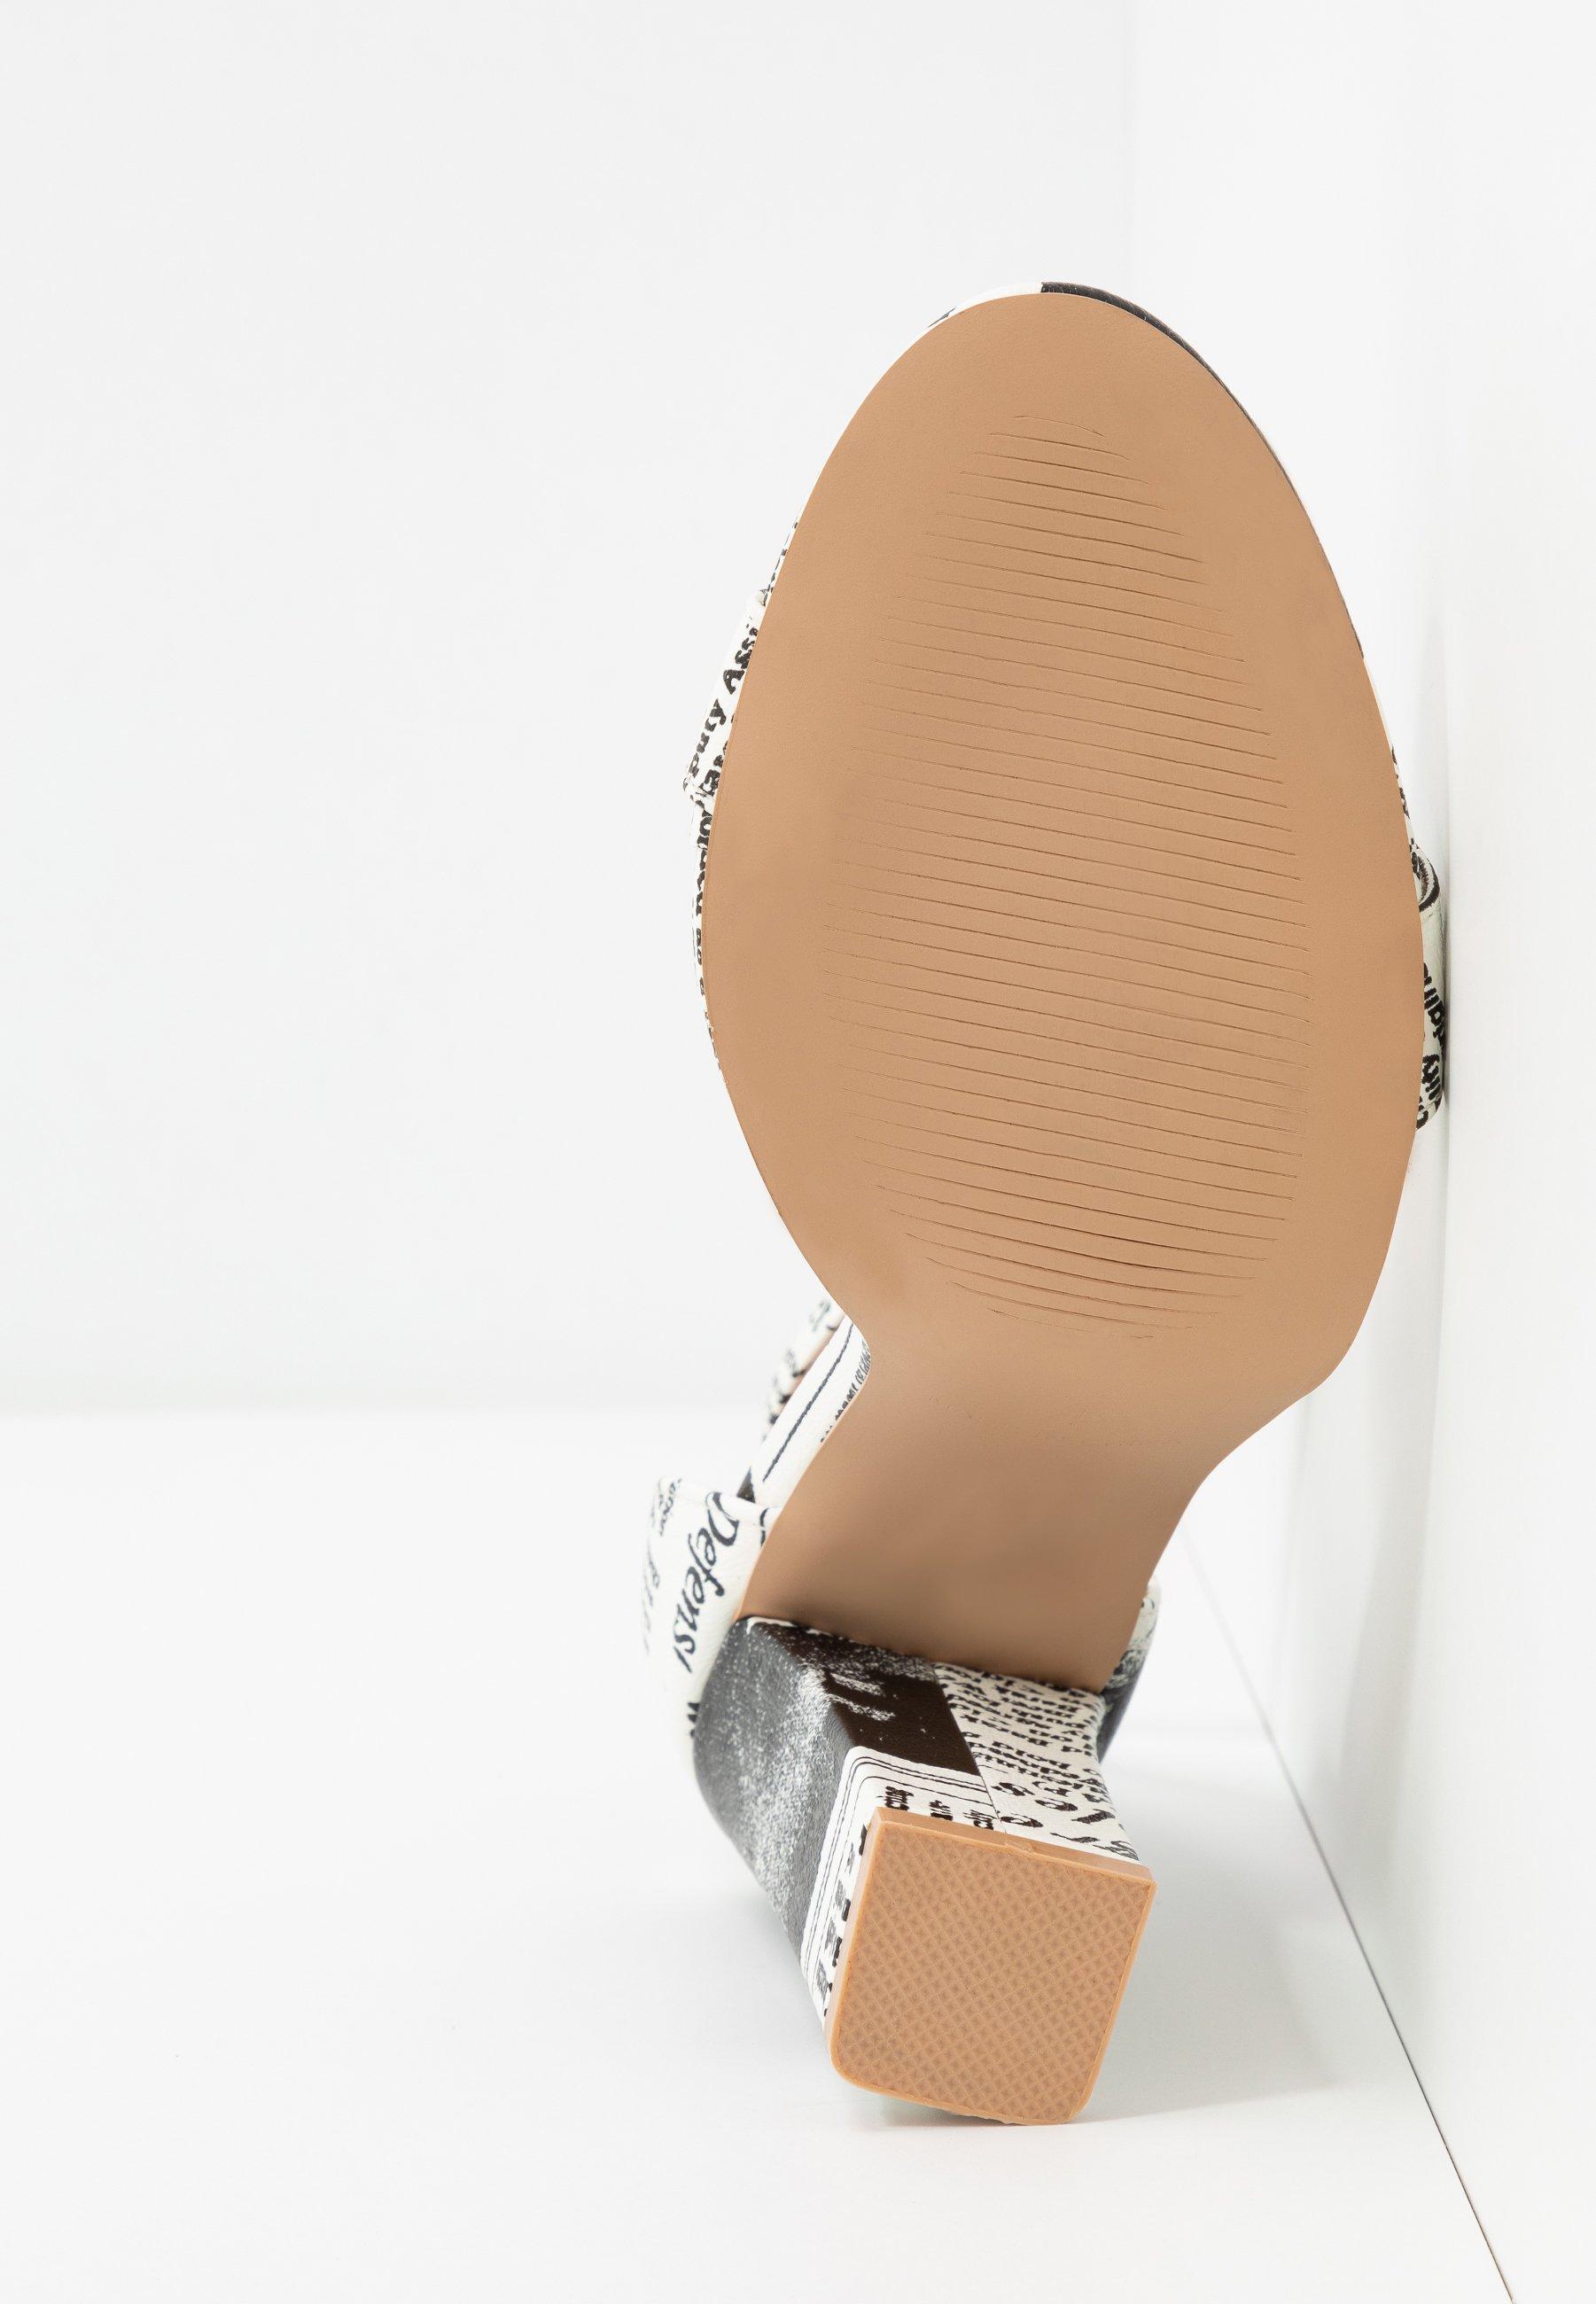 BEBO INARA - High Heel Sandalette - black/white  High Heels für Damen RSHti